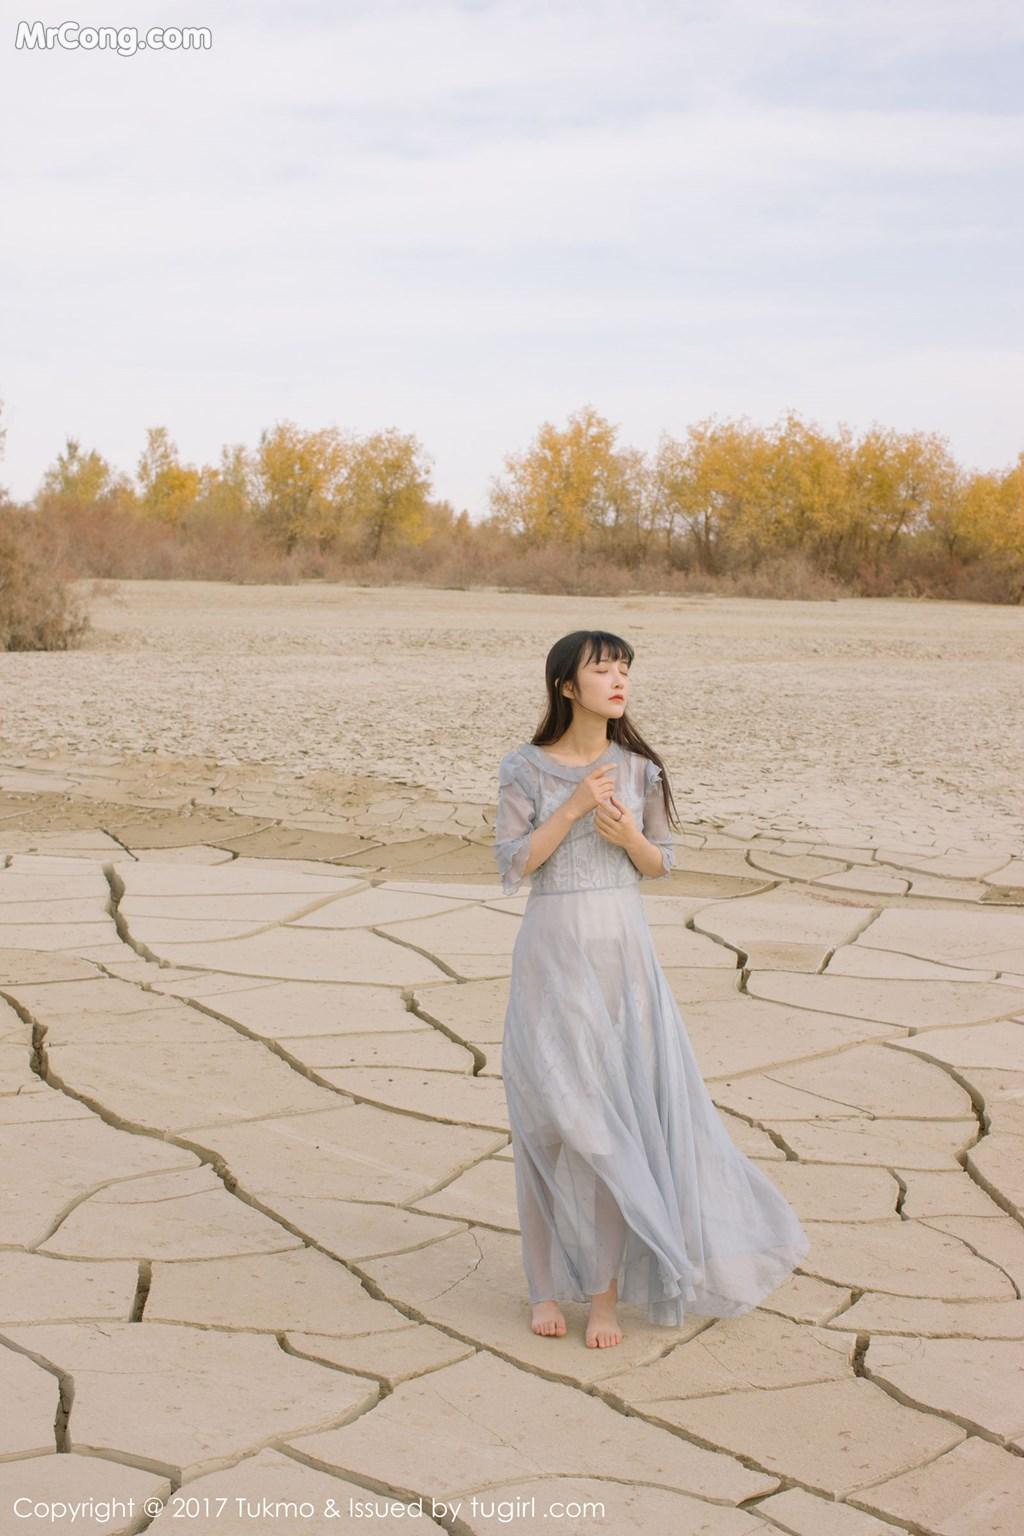 Image Tukmo-Vol.104-Zhi-Ying-MrCong.com-001 in post Tukmo Vol.104: Người mẫu Zhi Ying (之应) (41 ảnh)